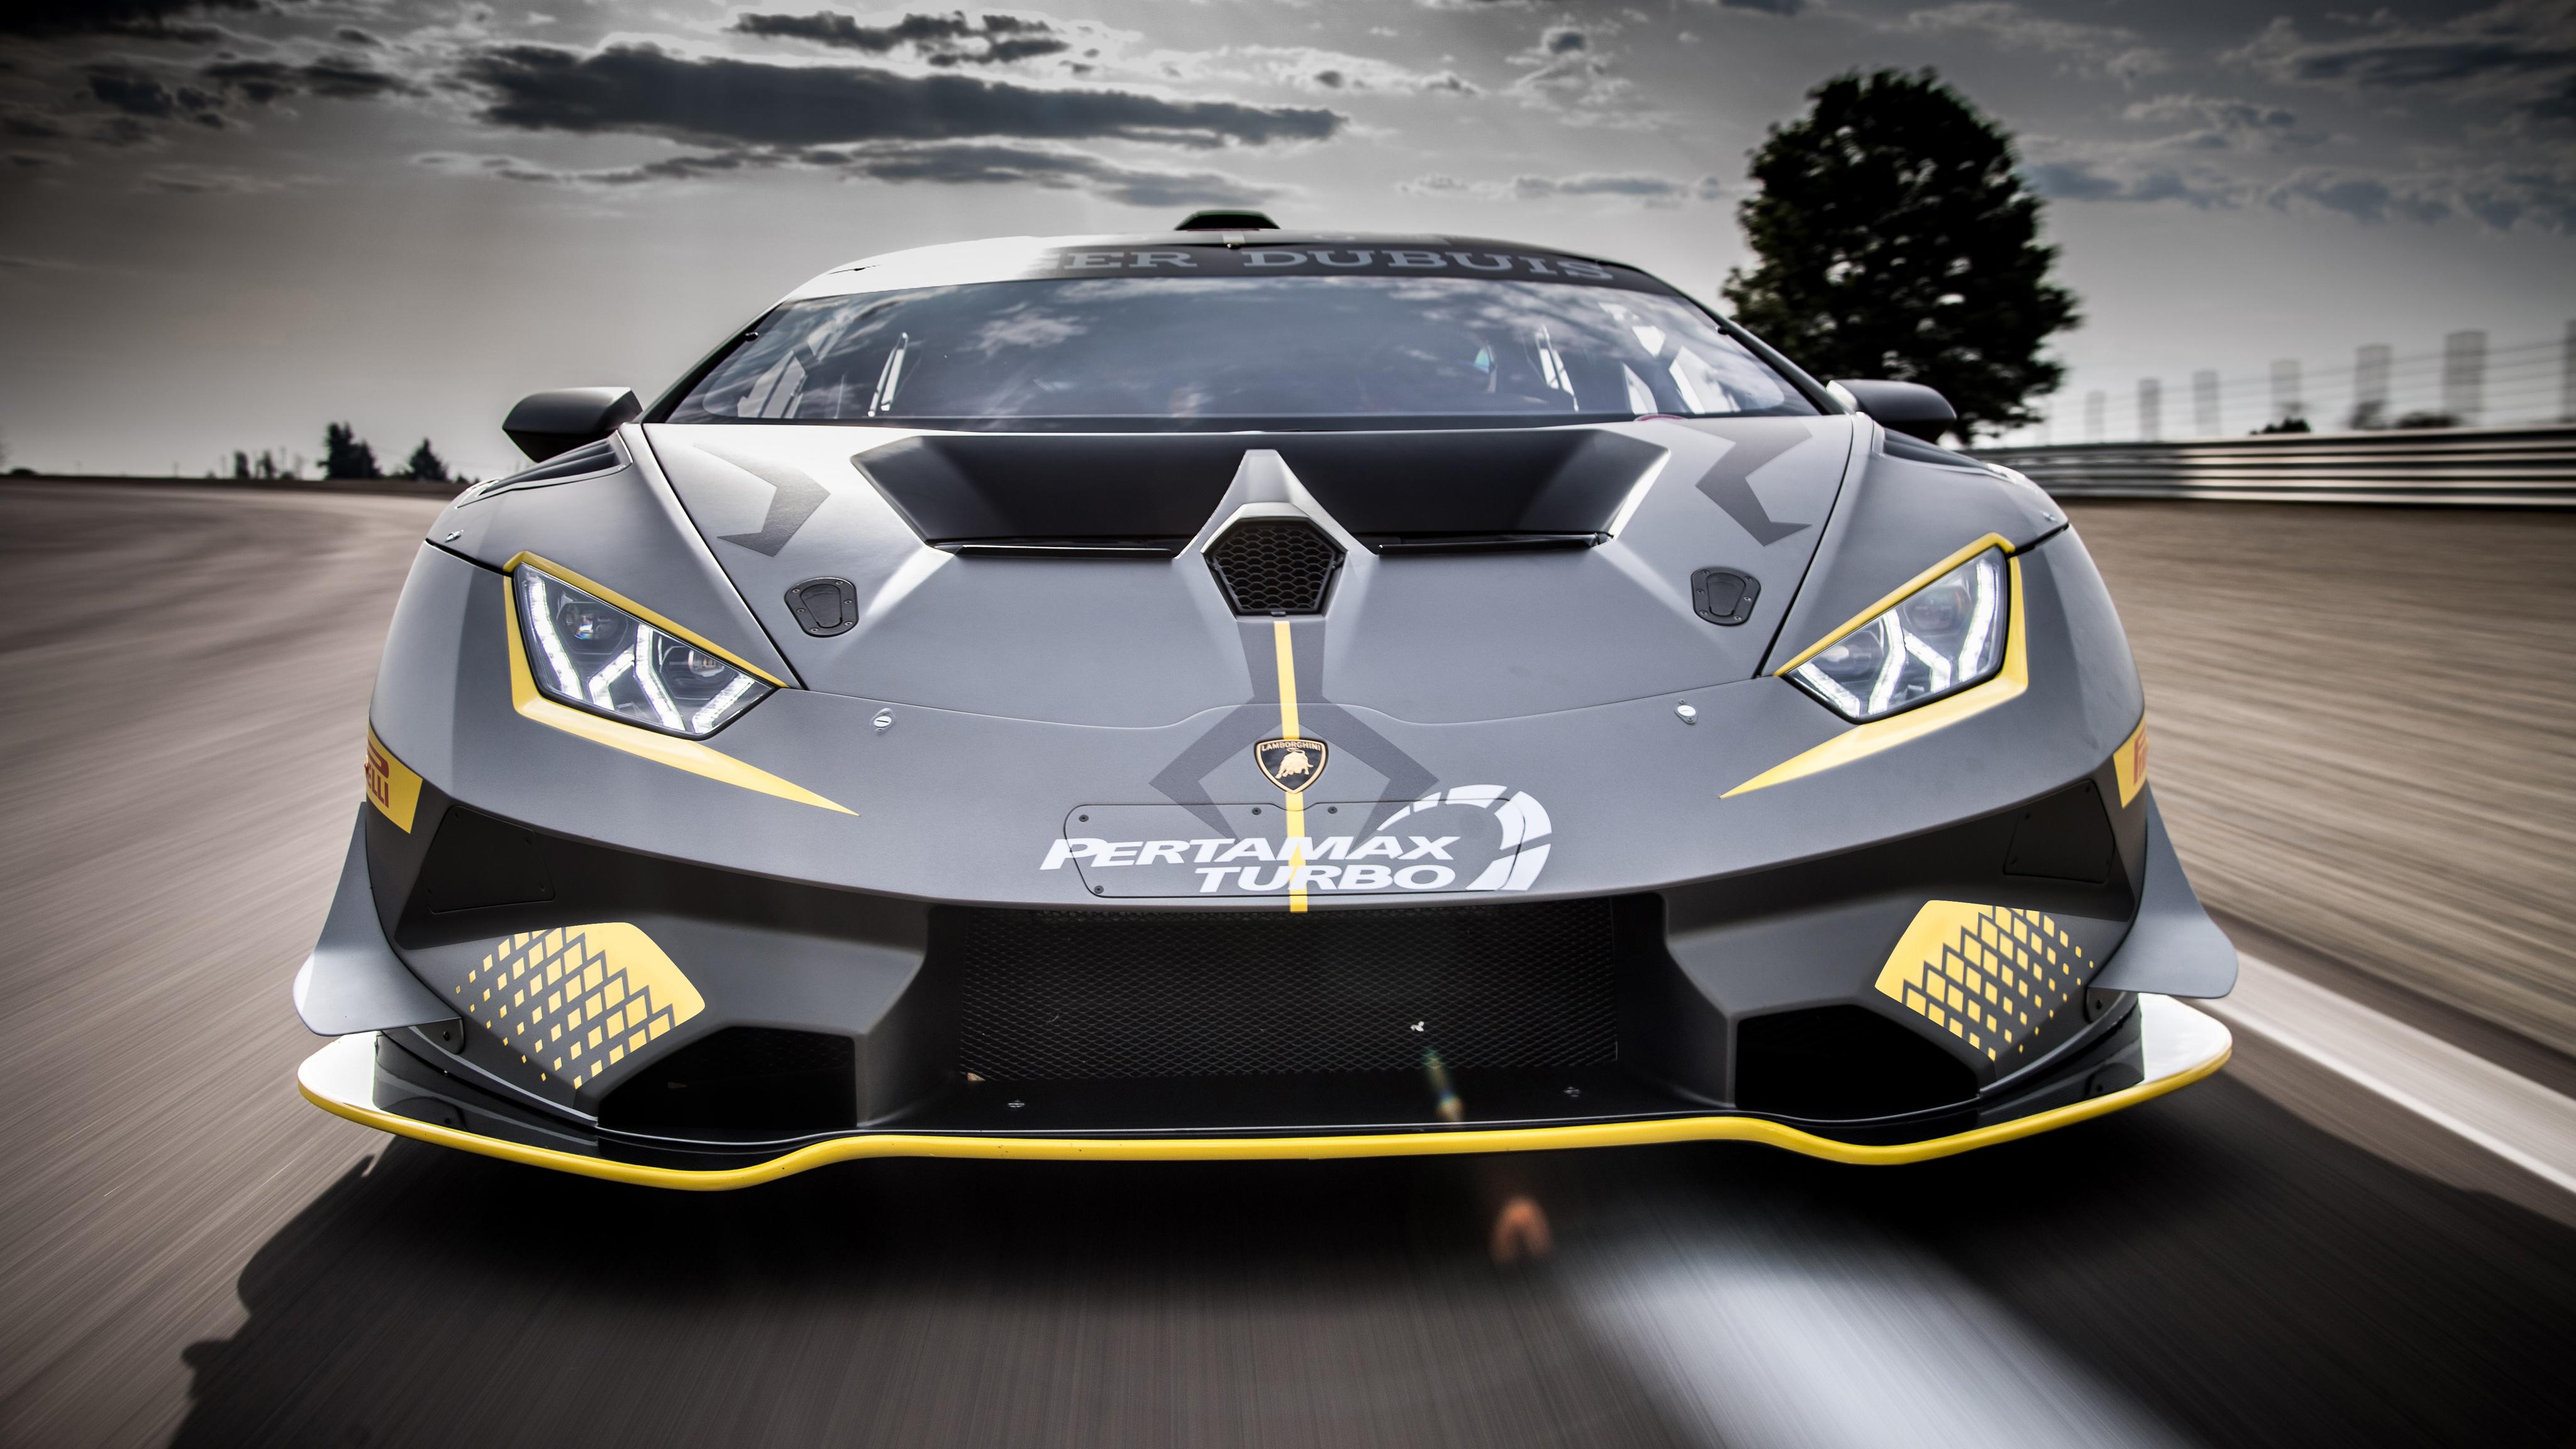 Related Images To Wallpaper Lamborghini Super Trofeo Crash